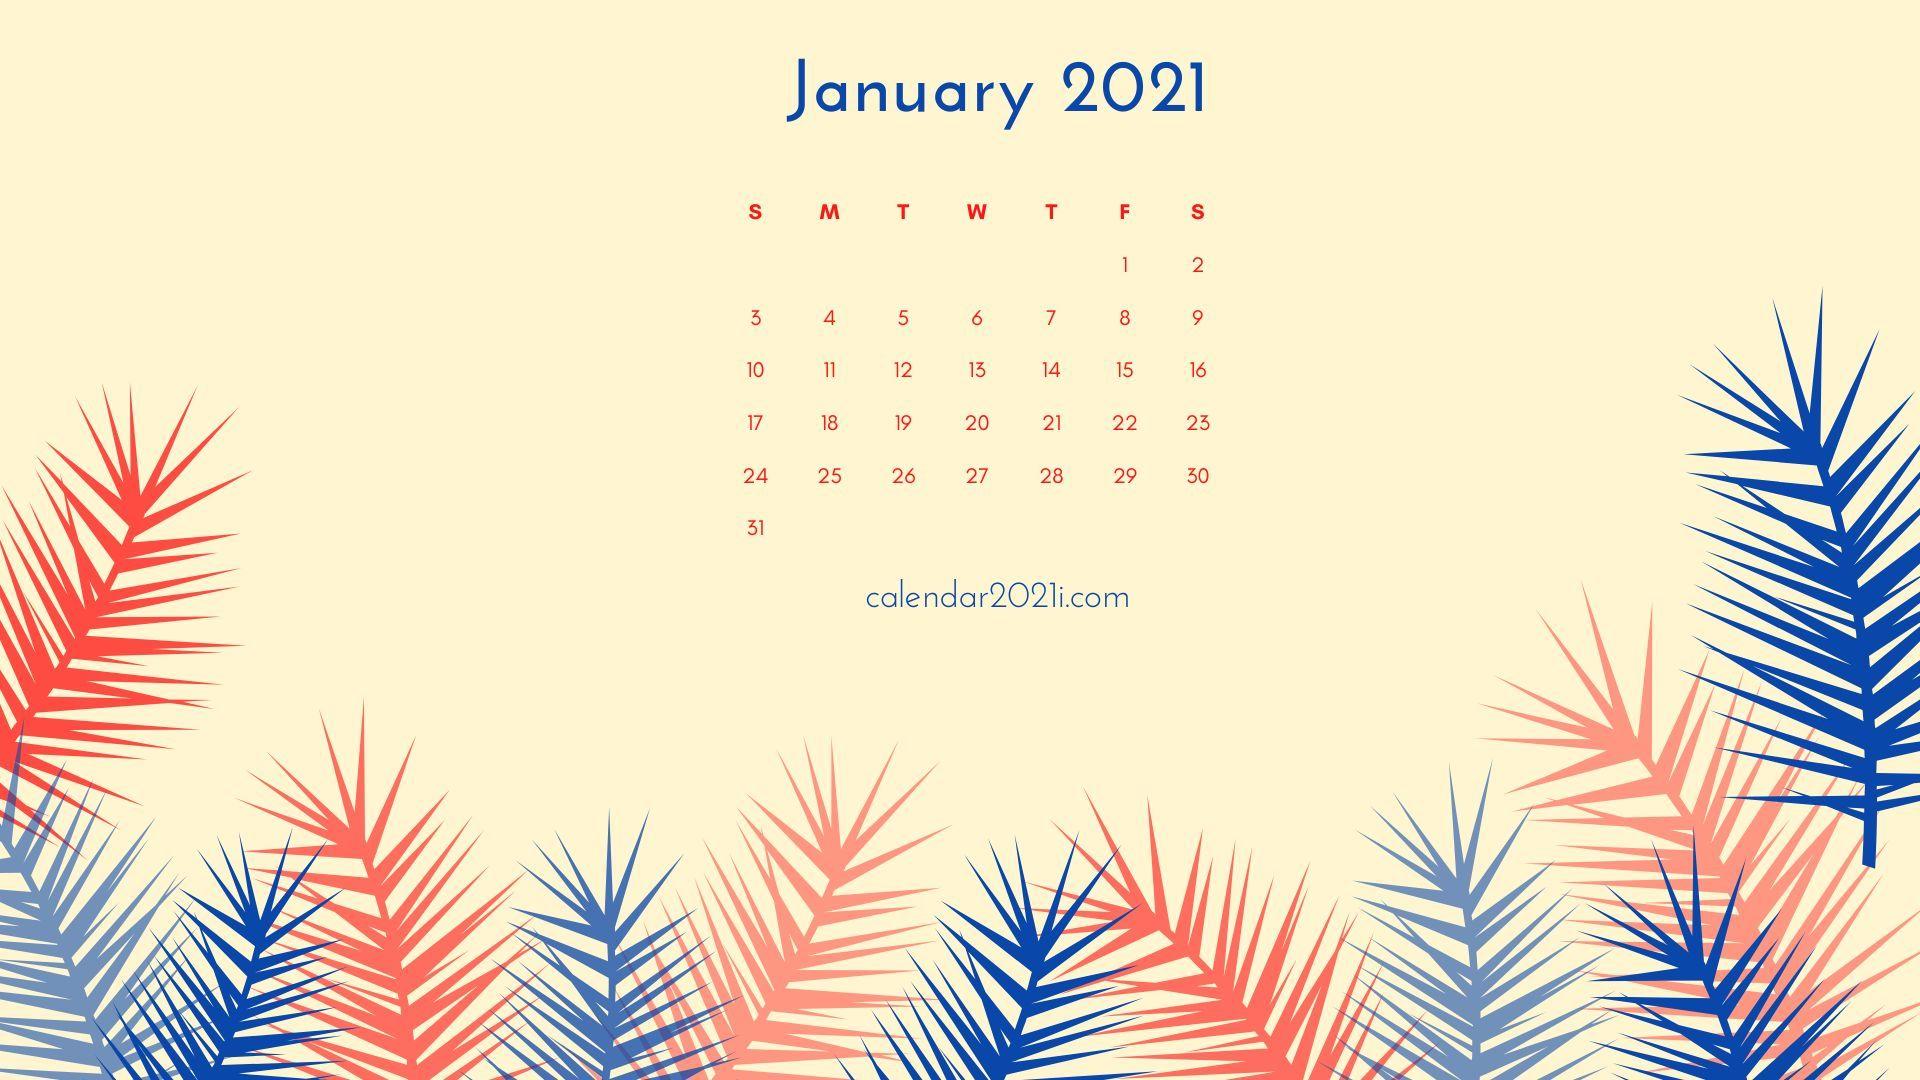 January 2021 Calendar Wallpaper Calendar wallpaper Printable 1920x1080